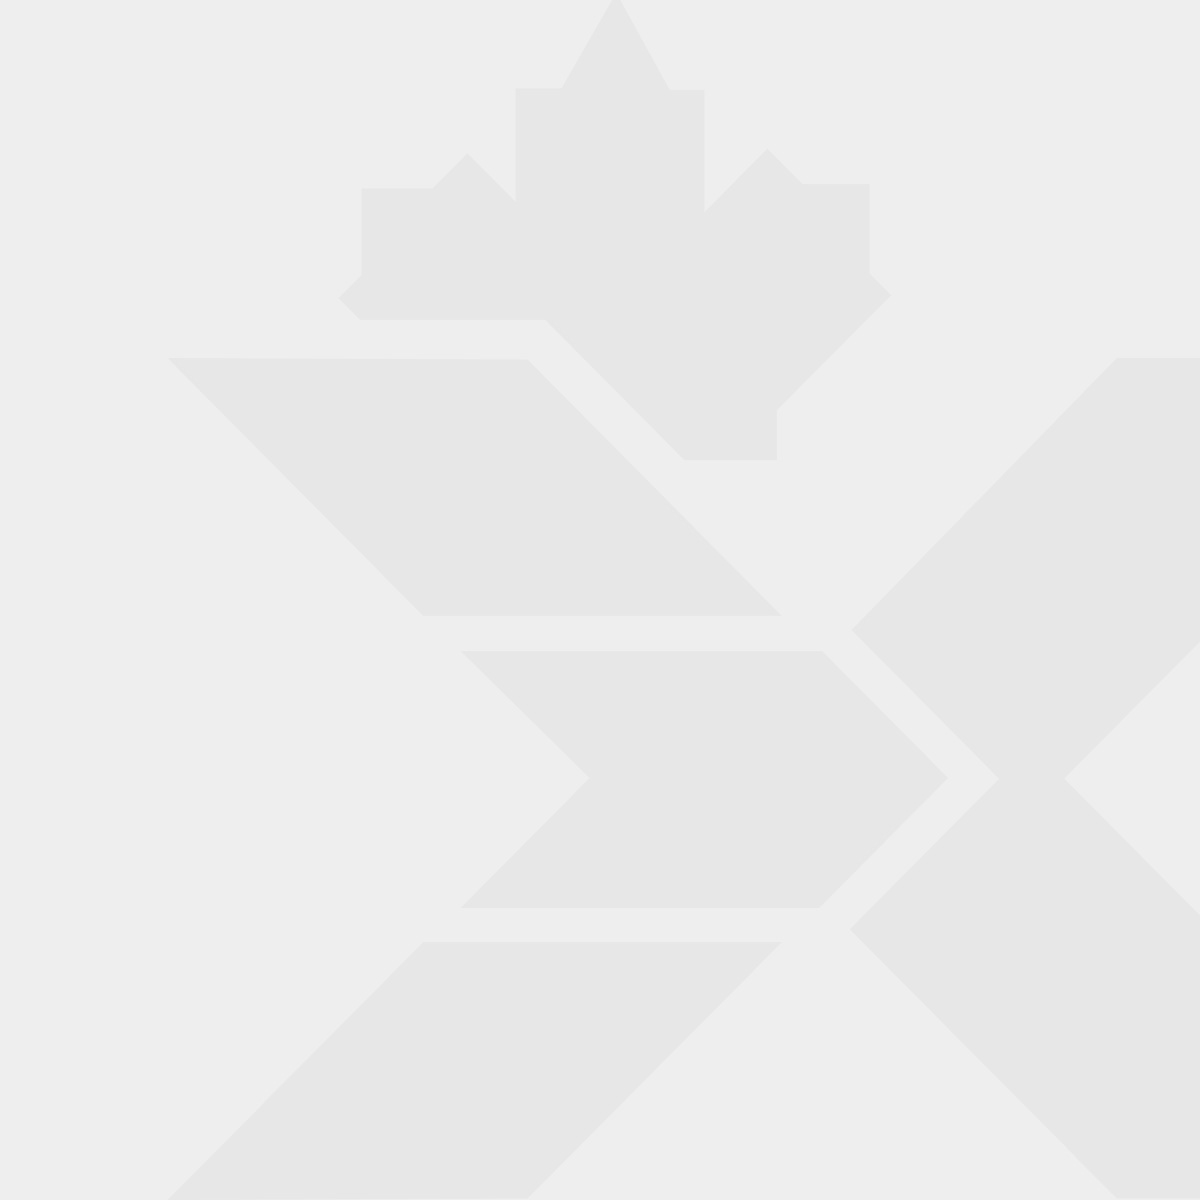 Militaire Magasin Du Canada Canex Le 35uJlFcTK1